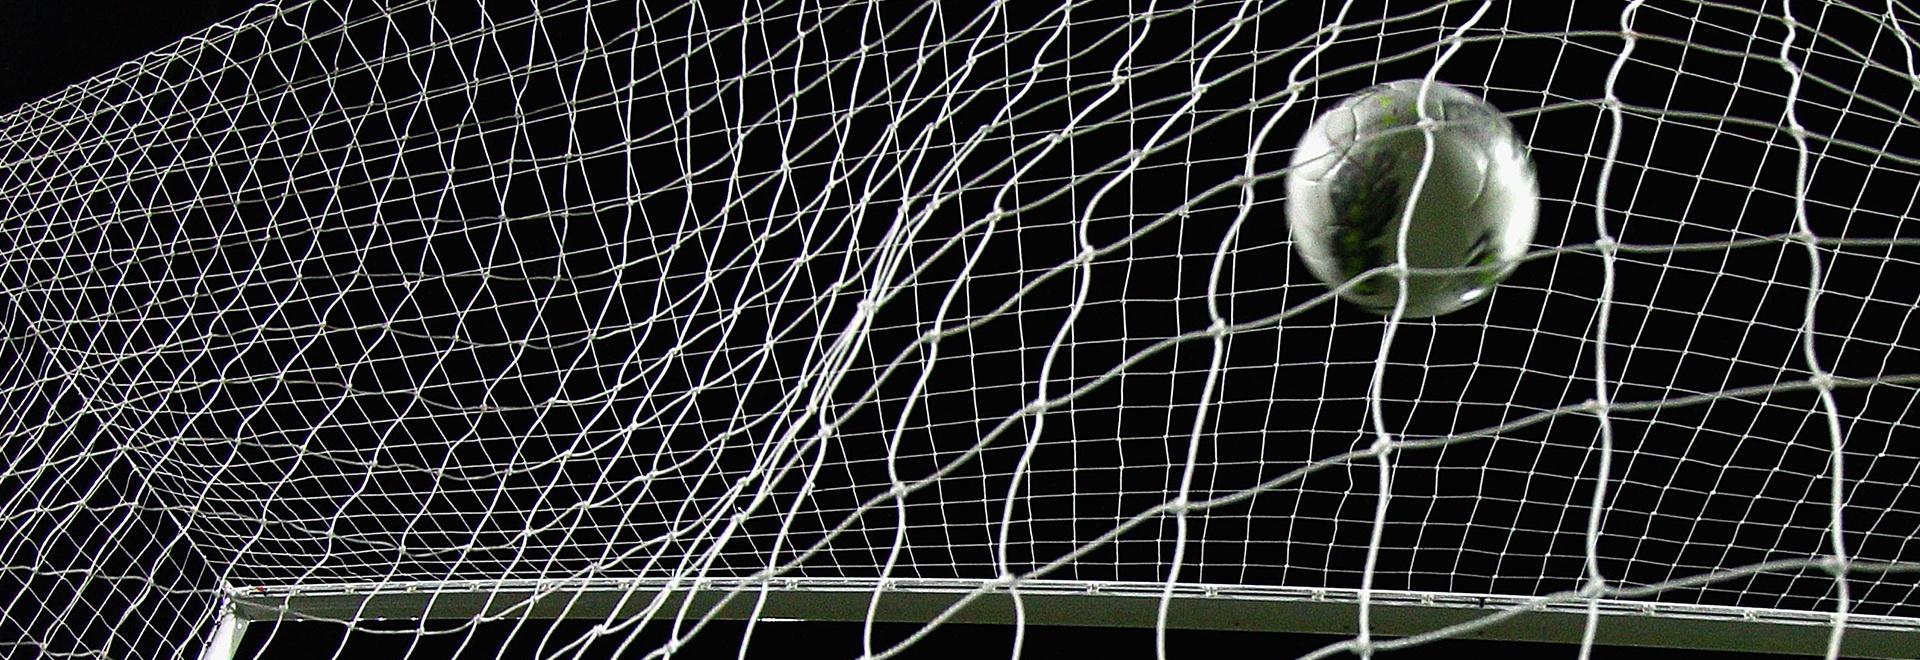 Tutti i gol della Bundesliga